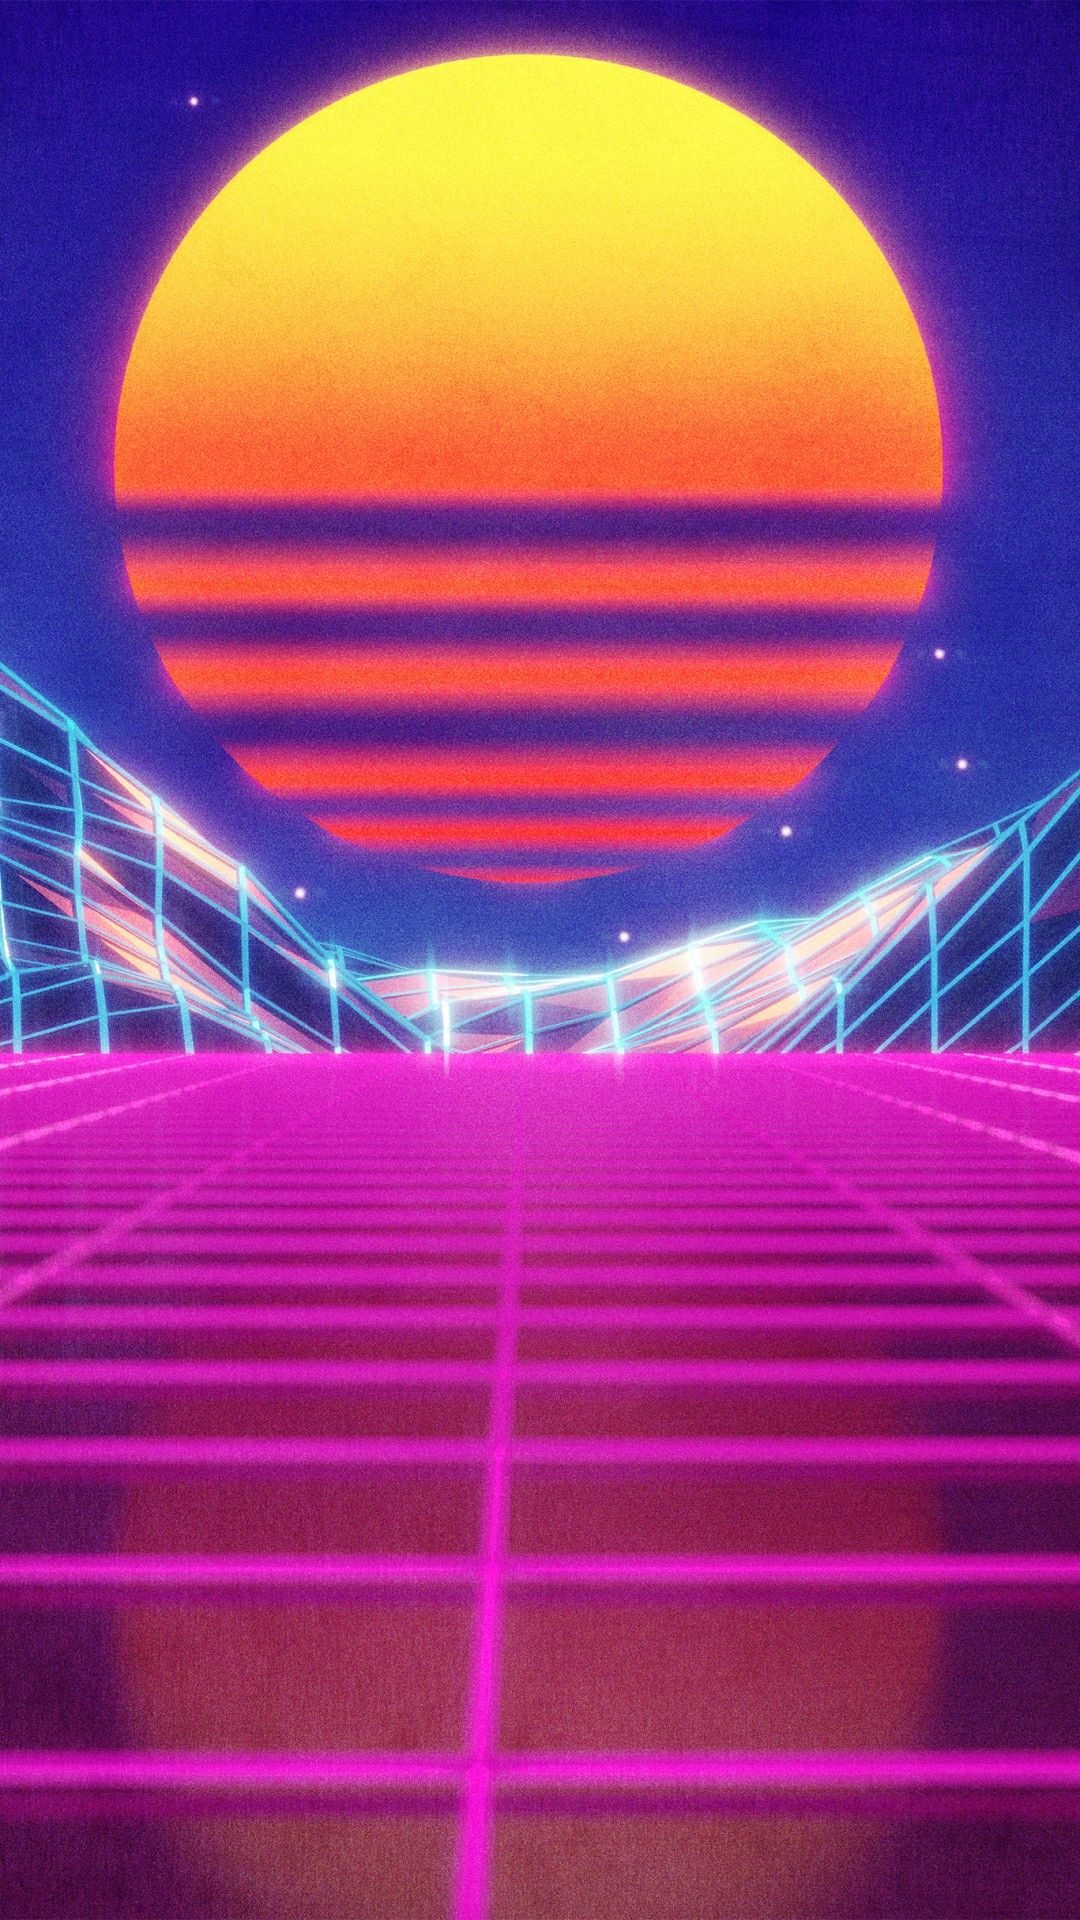 follow aesthetic magik 👑 Waves wallpaper, Vaporwave